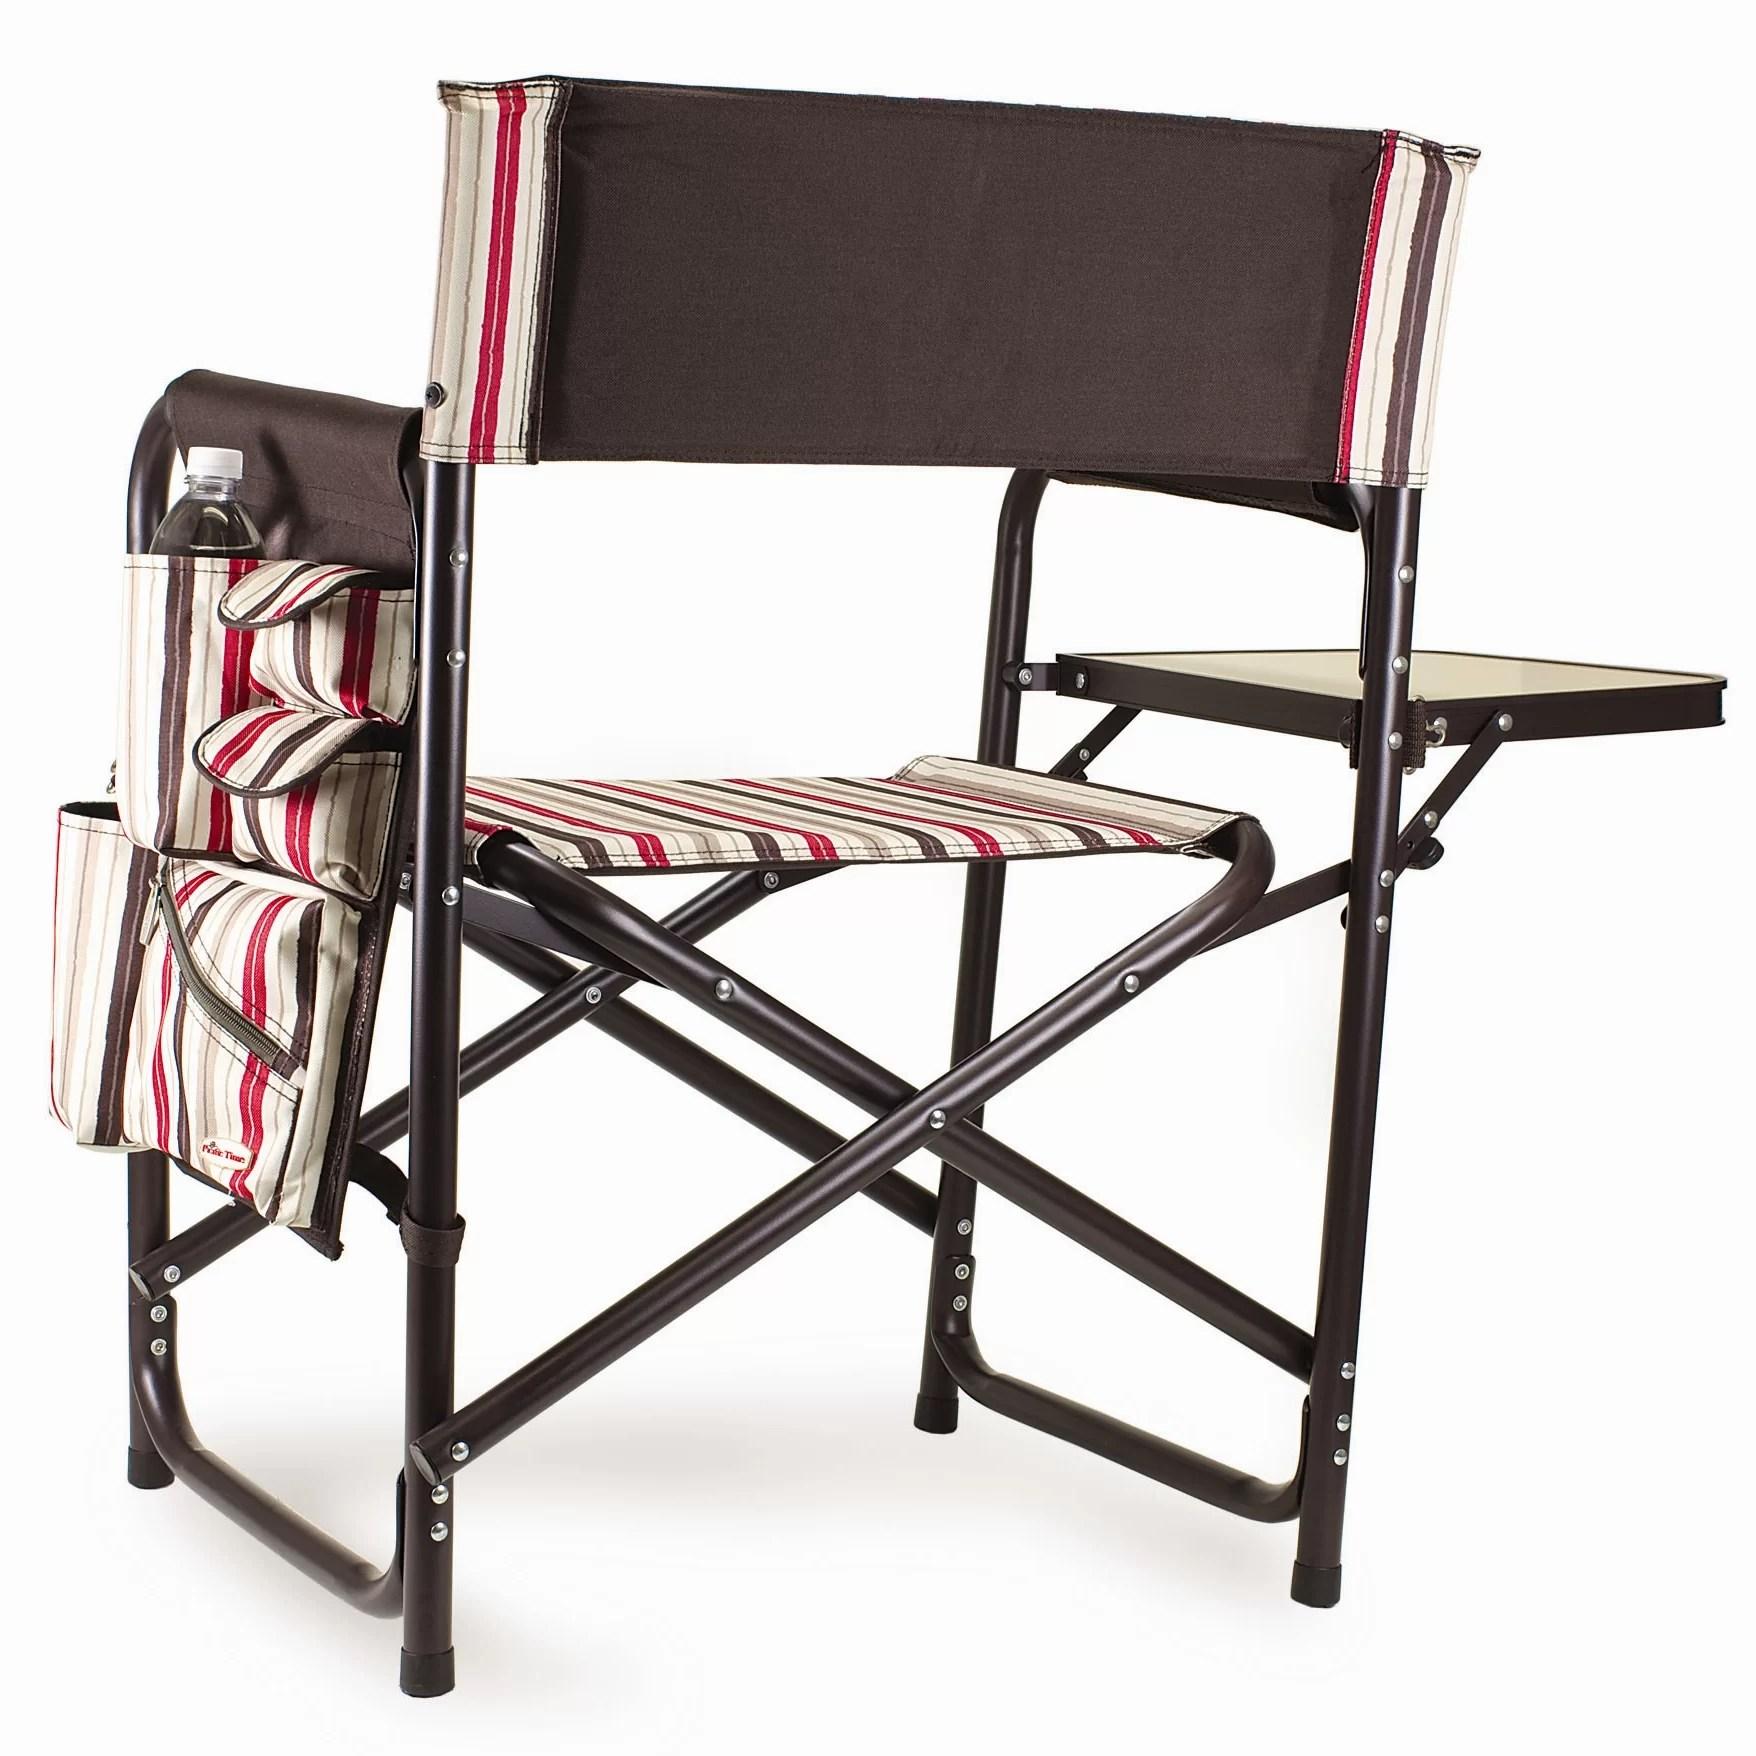 Picnic Time Sports Chair  eBay